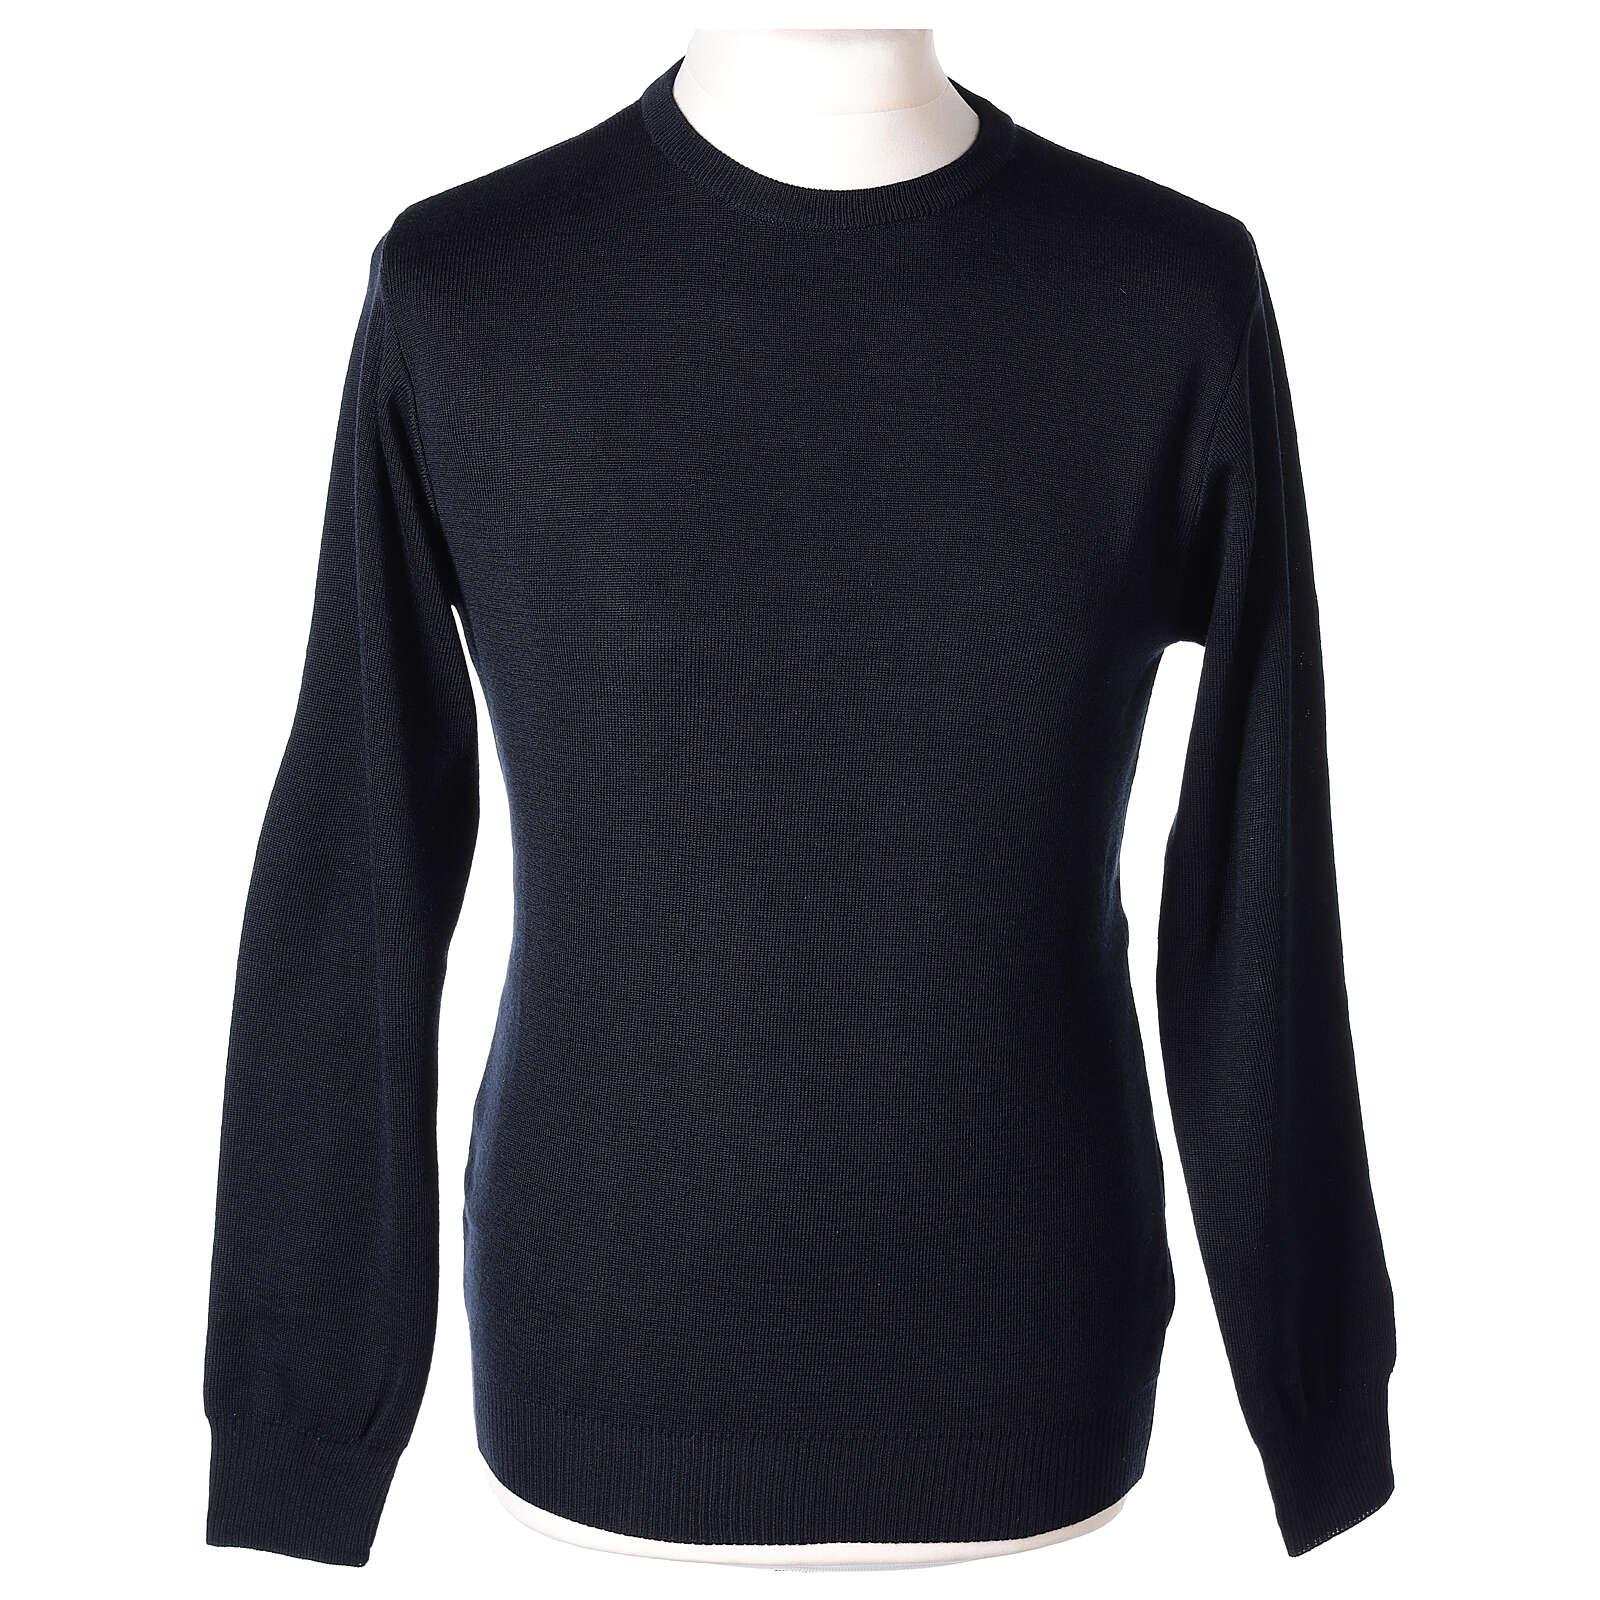 Pulôver sacerdote de gola redonda azul escuro em tela uniforme 50% lã de merino 50% acrílico In Primis 4